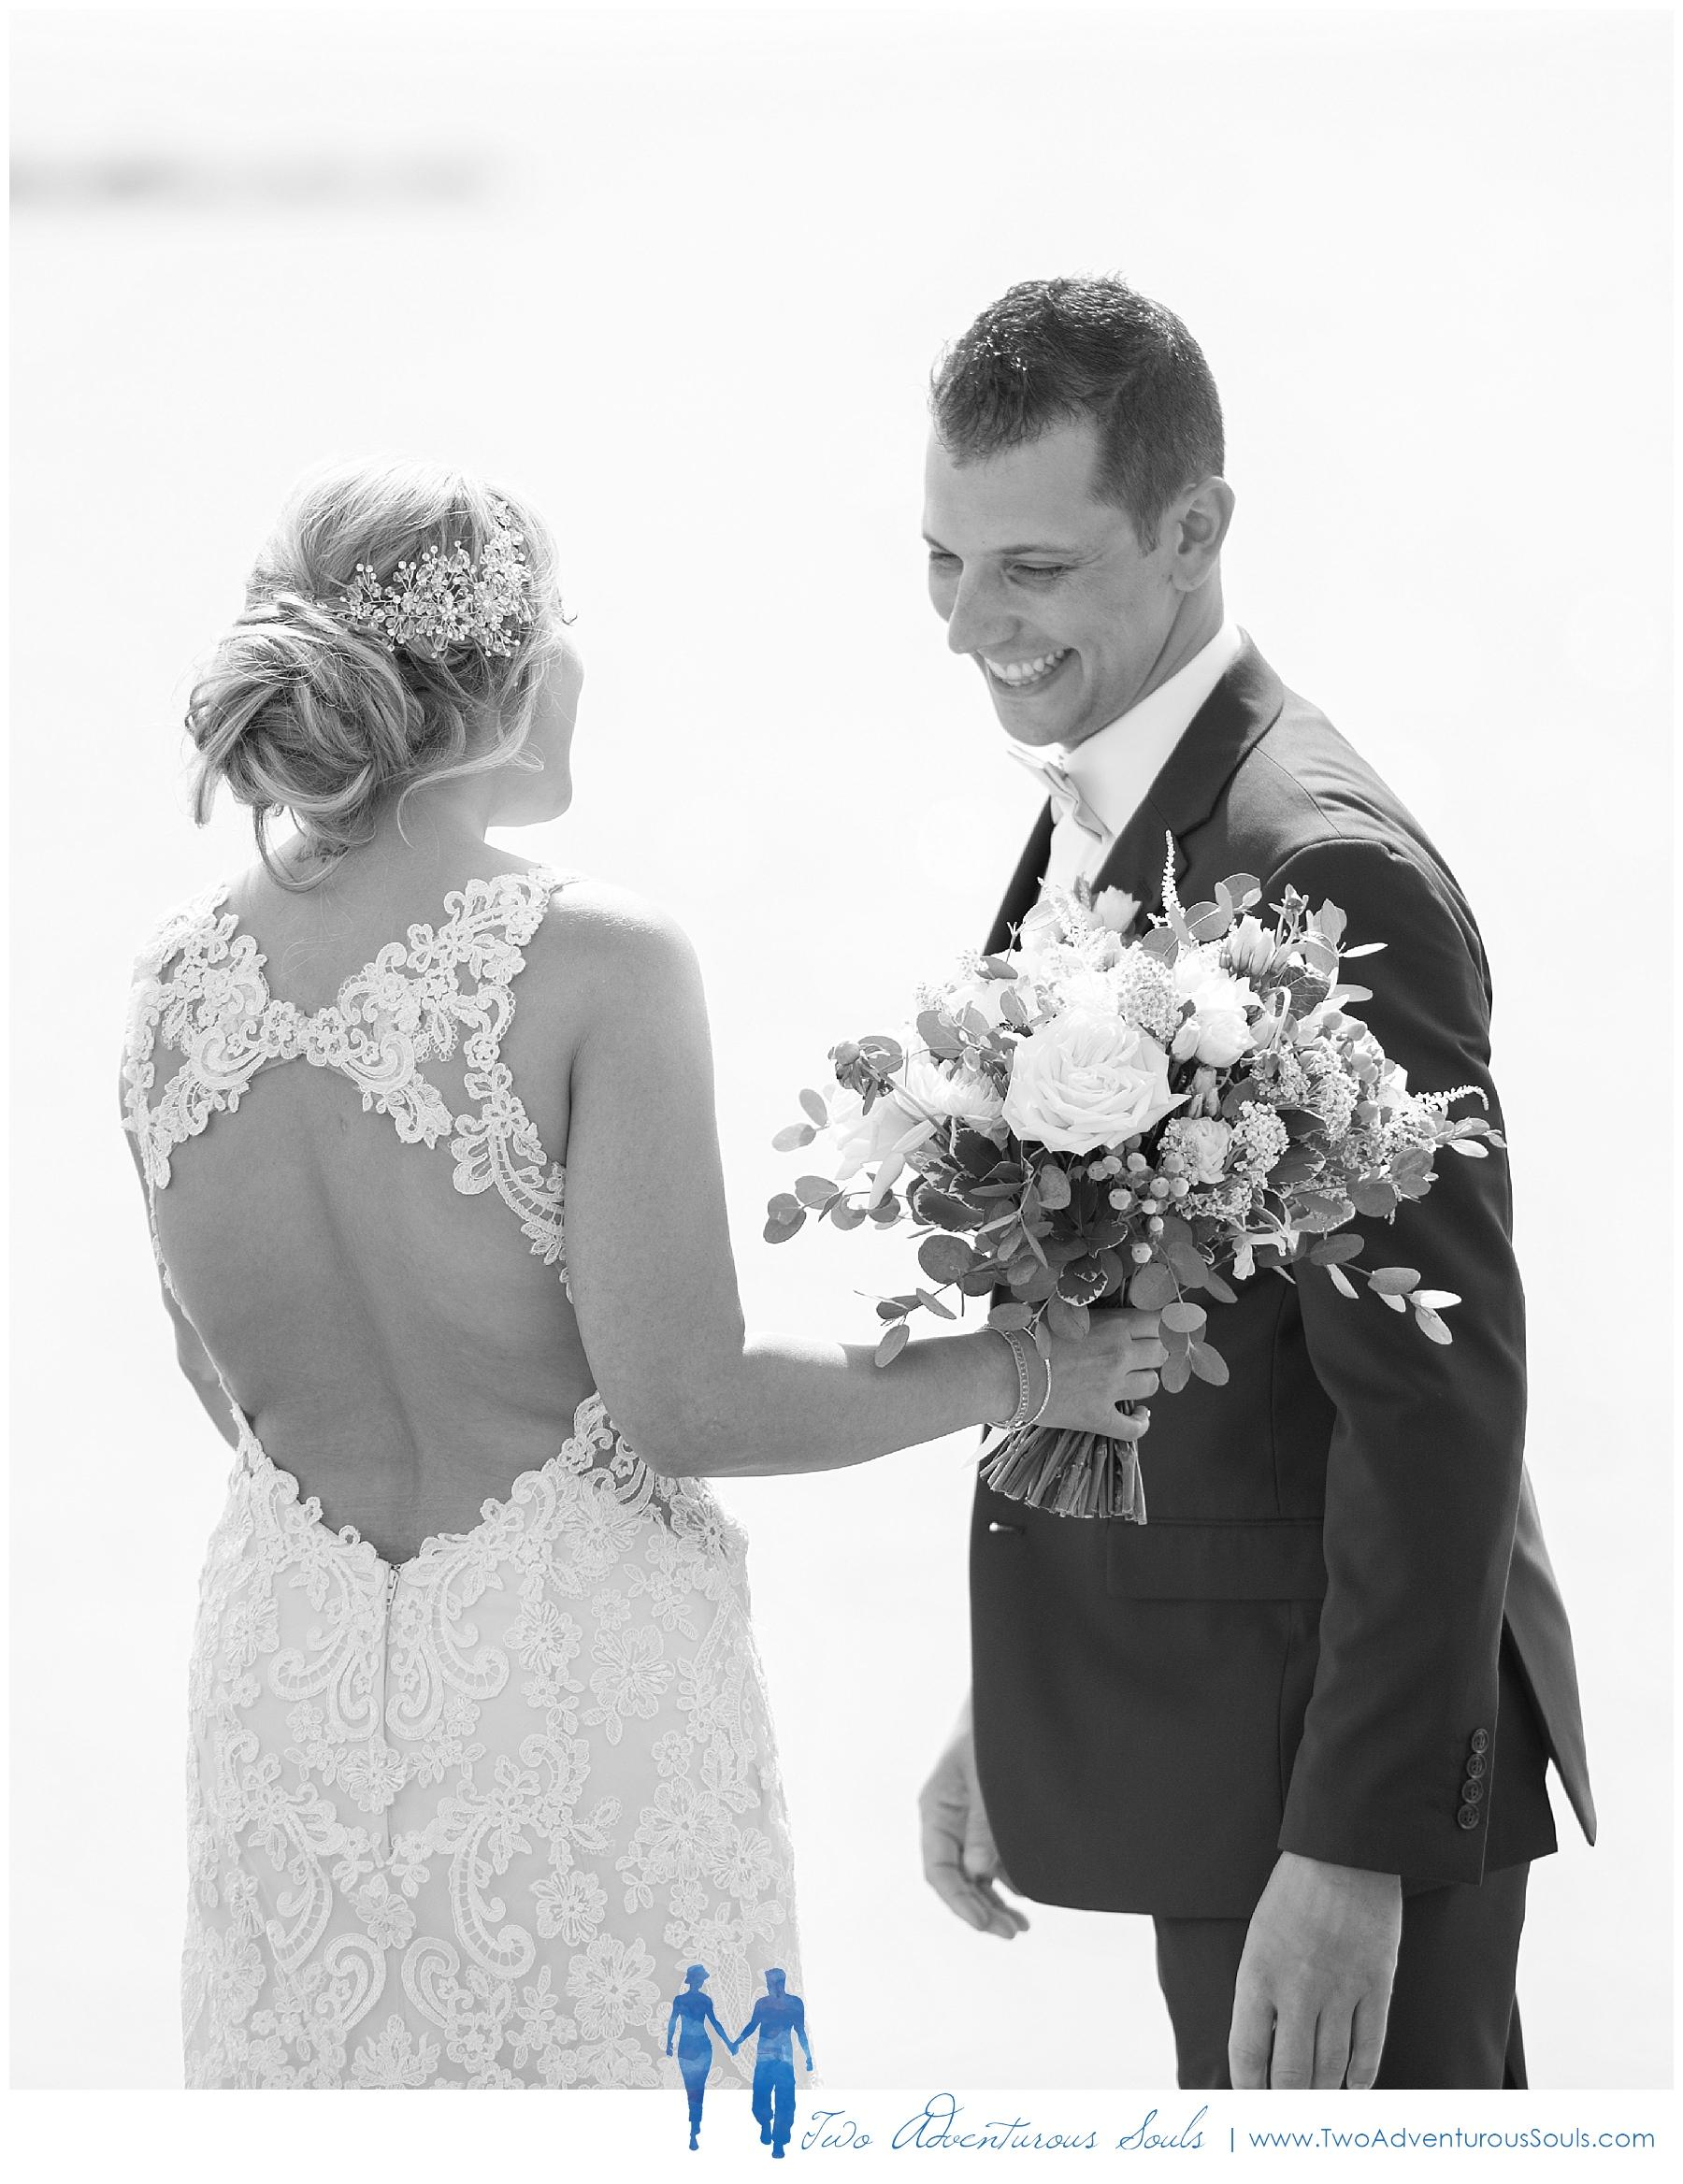 Connecticut Wedding Photographers, Lace Factory Wedding Photographers, Two Adventurous Souls - 083119_0020.jpg